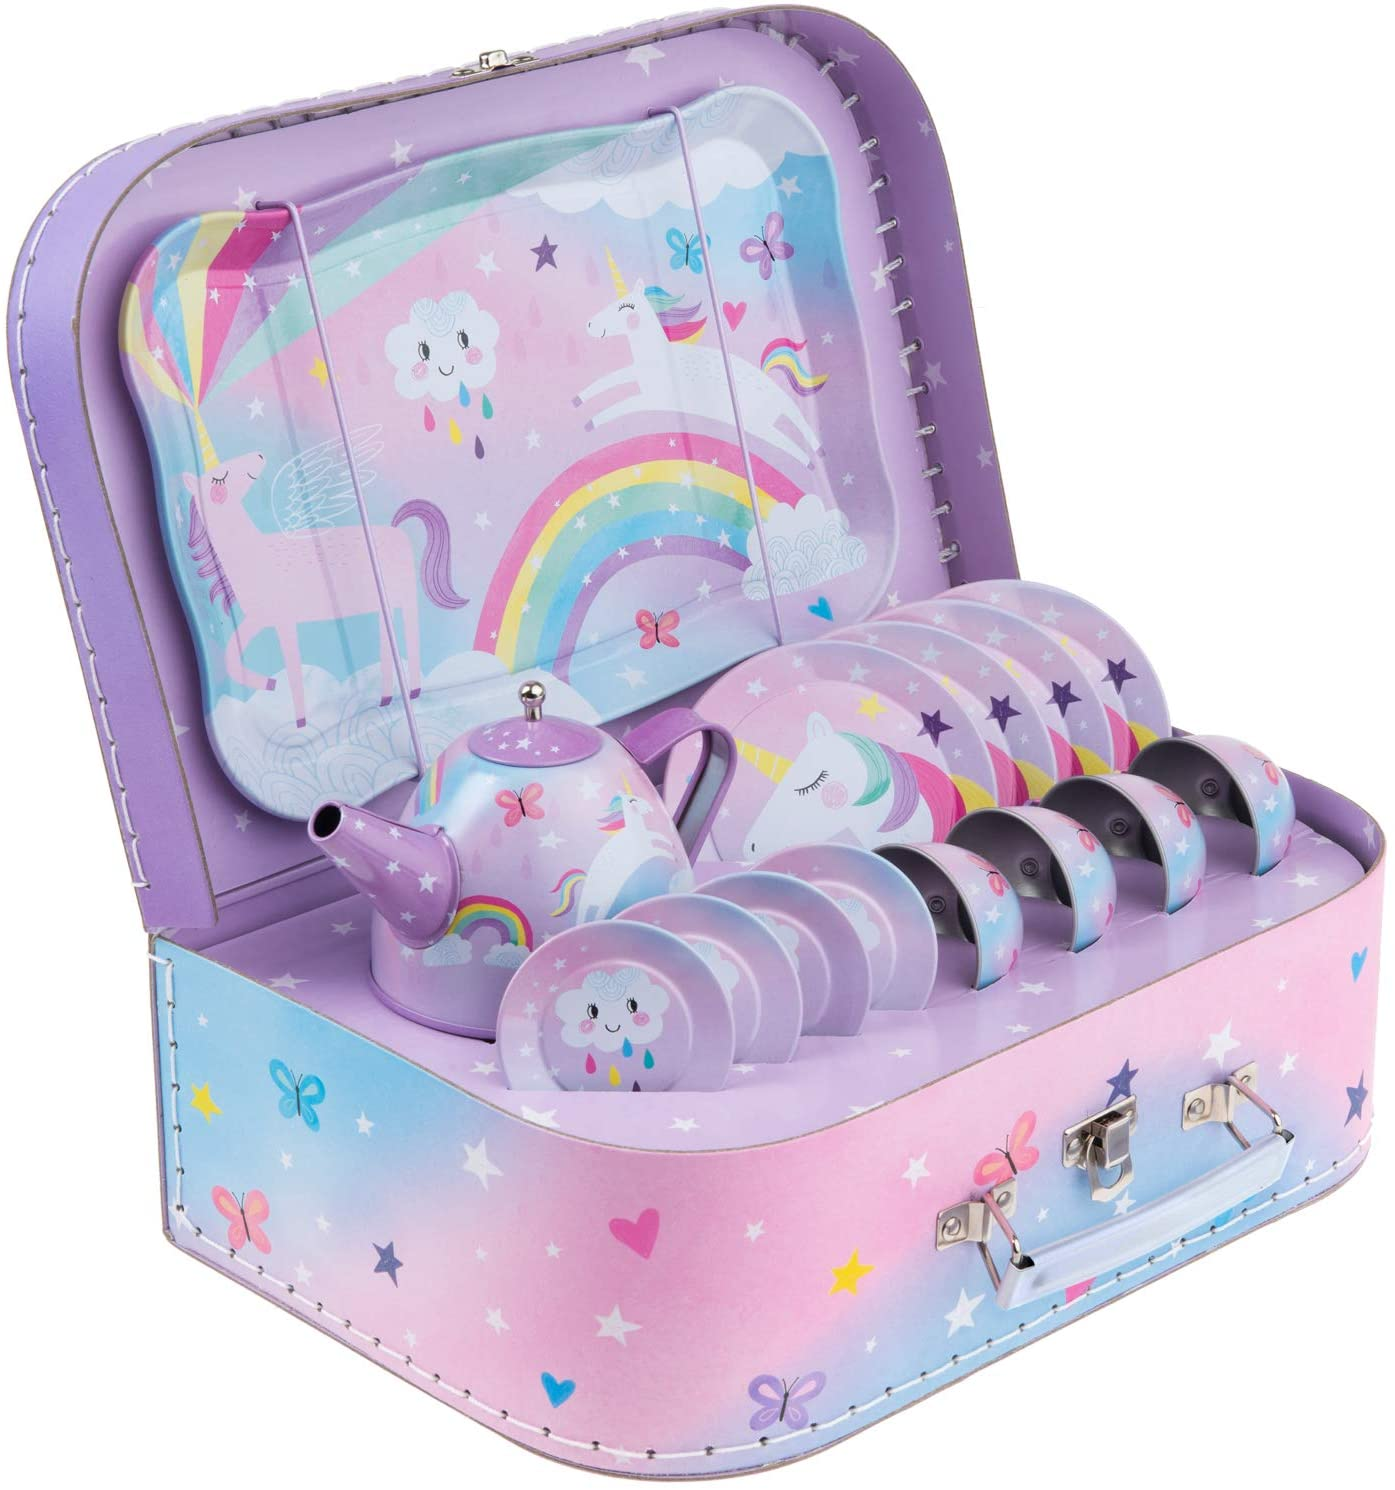 unicorn-gifts-for-girls-tea-set